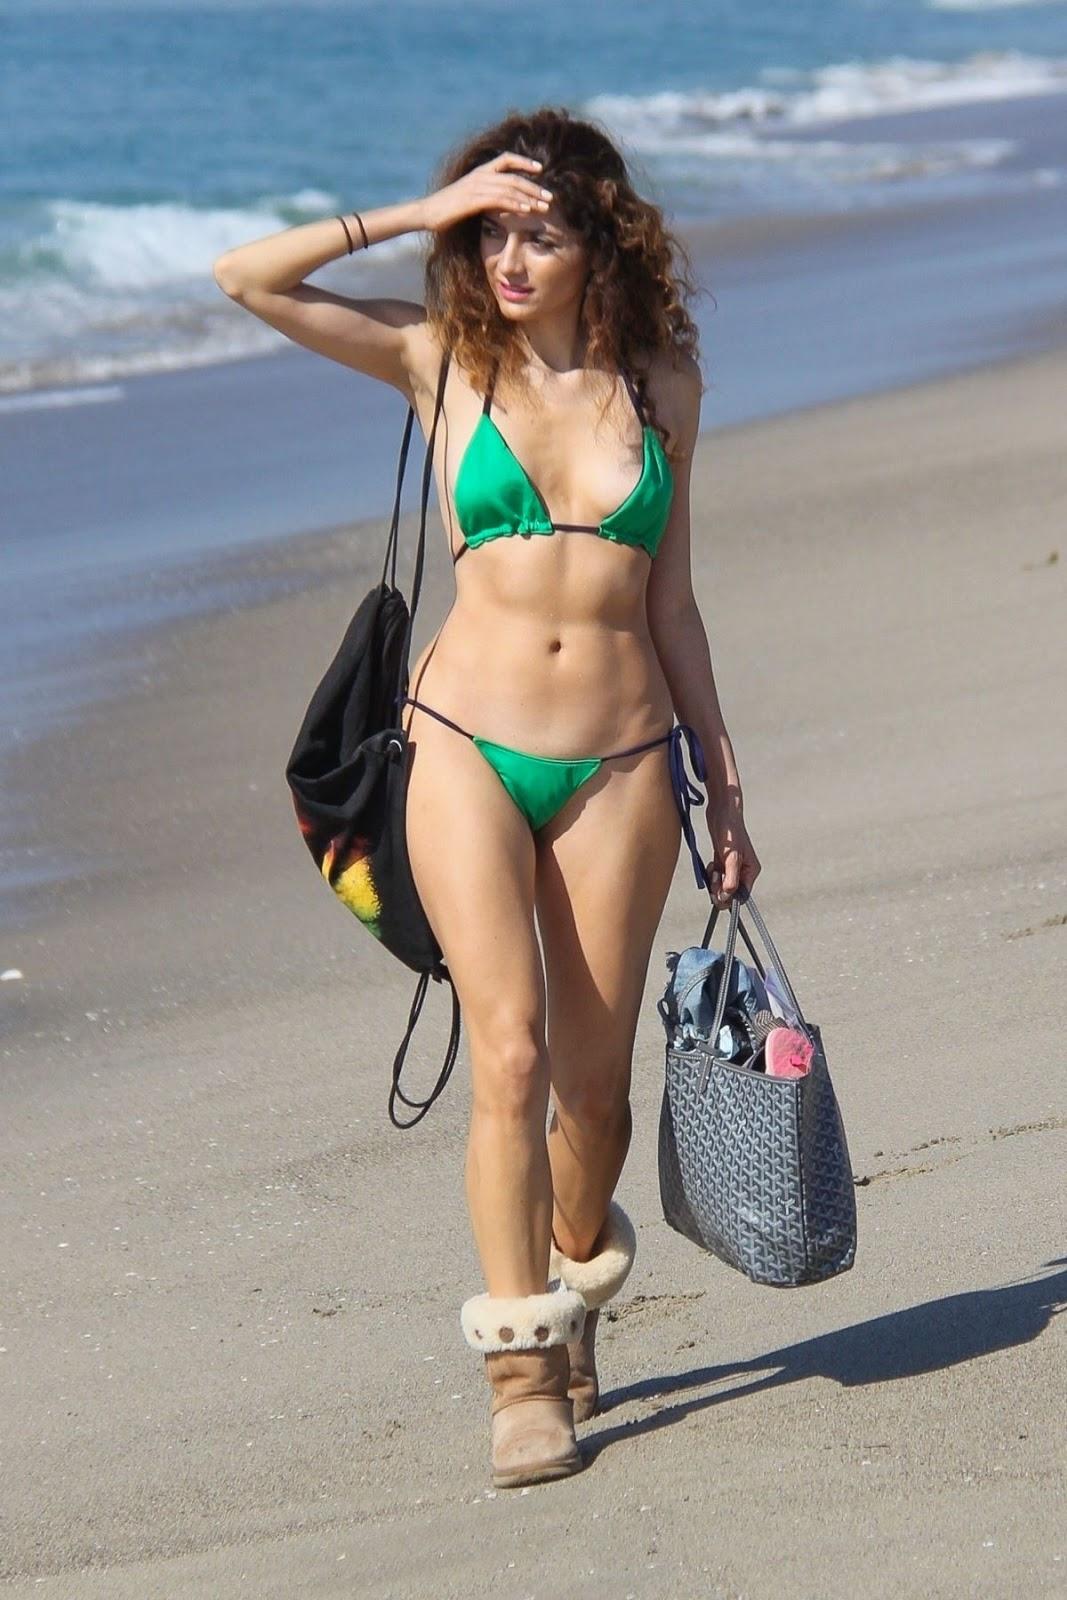 Victoria Justice in bikini live, June 2019,Julie engelbrecht naked Sex fotos Alana mamaeva nude leaked 7 photos,Vida guerra bikini